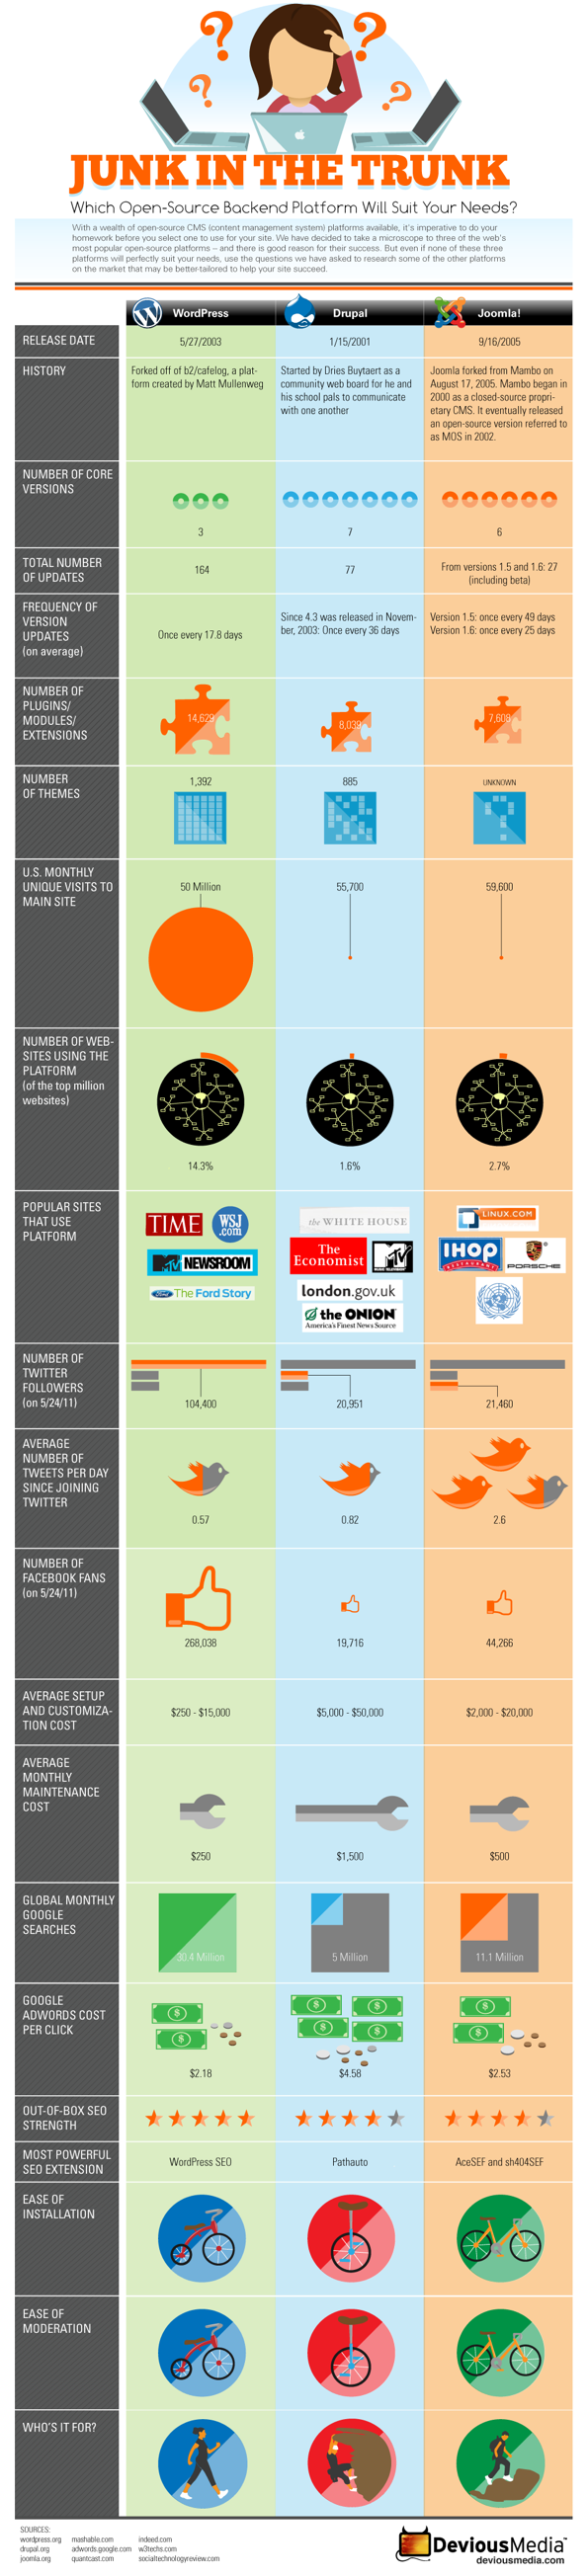 infografico wordpress joomla drupal